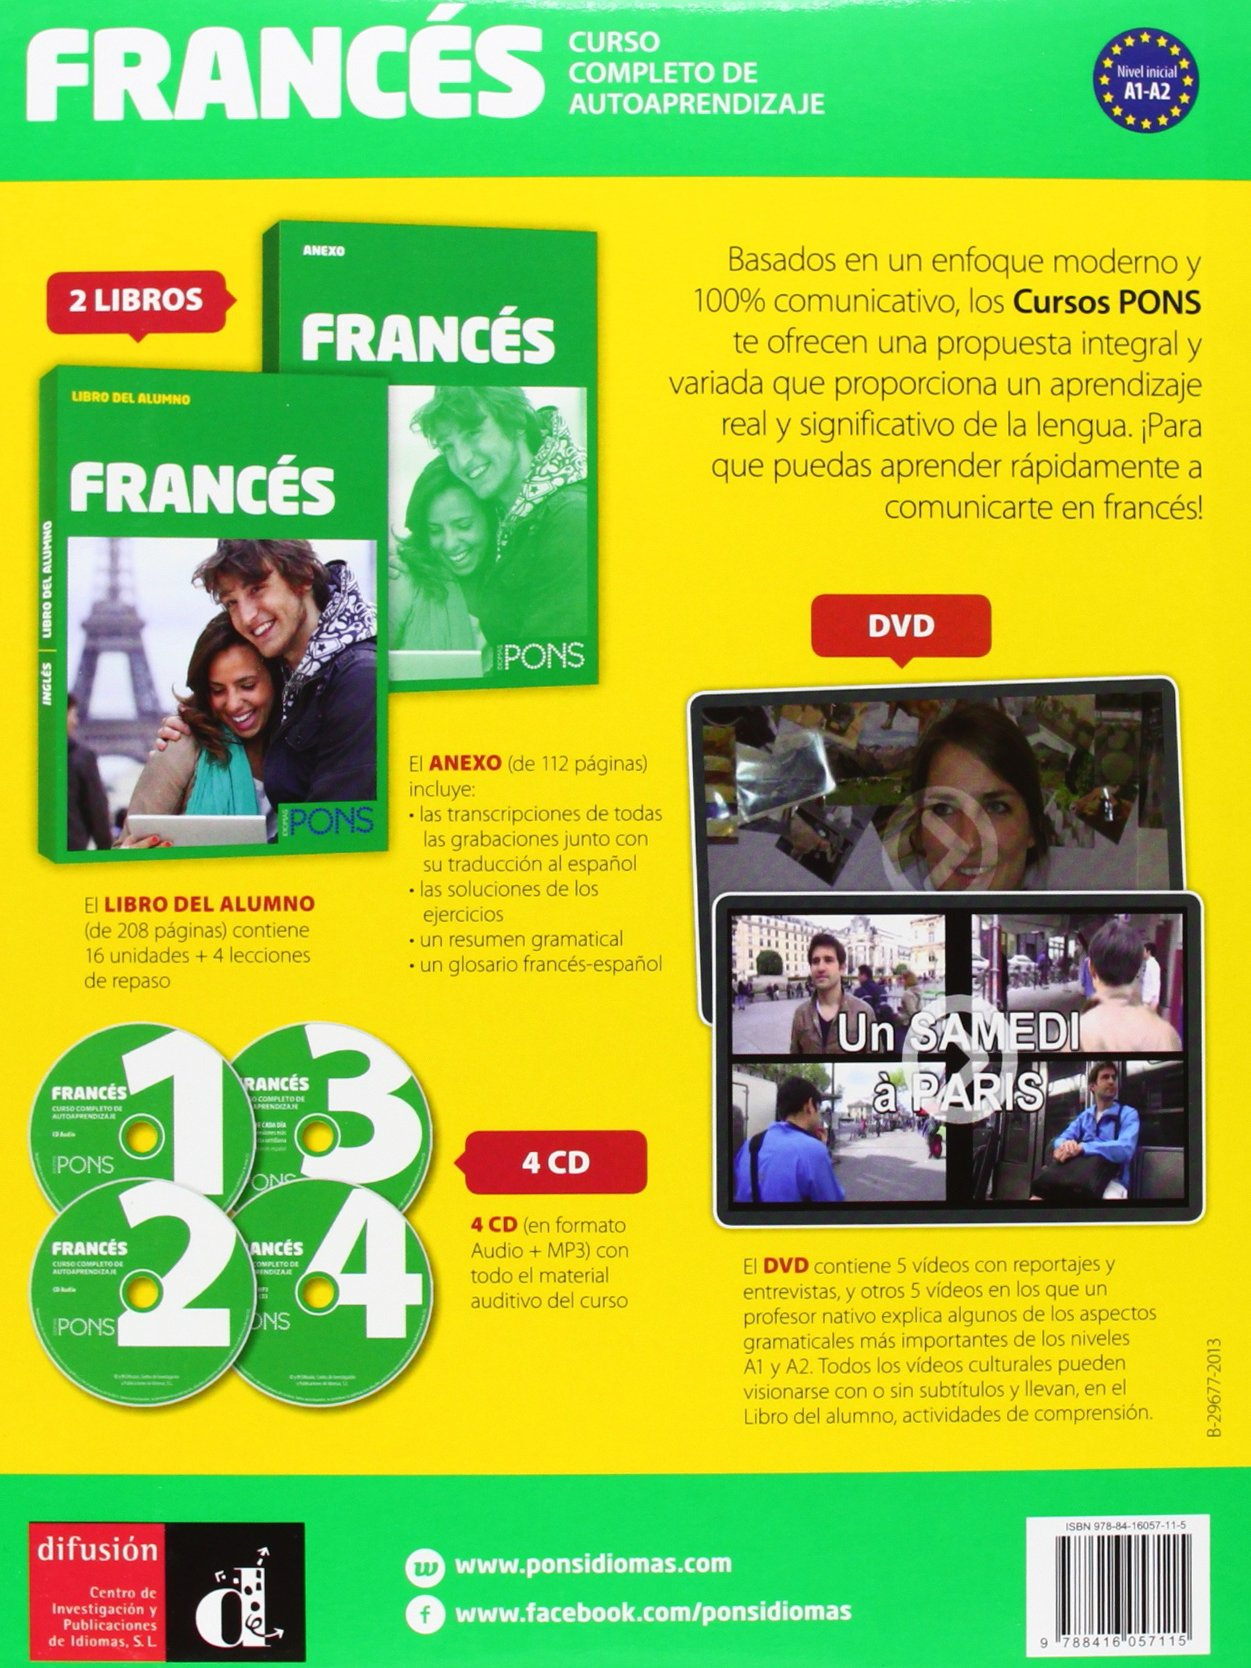 Curso pons frances a1 a2 4cd audio mp3 dvd 2014 spanish curso pons frances a1 a2 4cd audio mp3 dvd 2014 spanish edition varios autores 9788416057115 amazon books fandeluxe Images